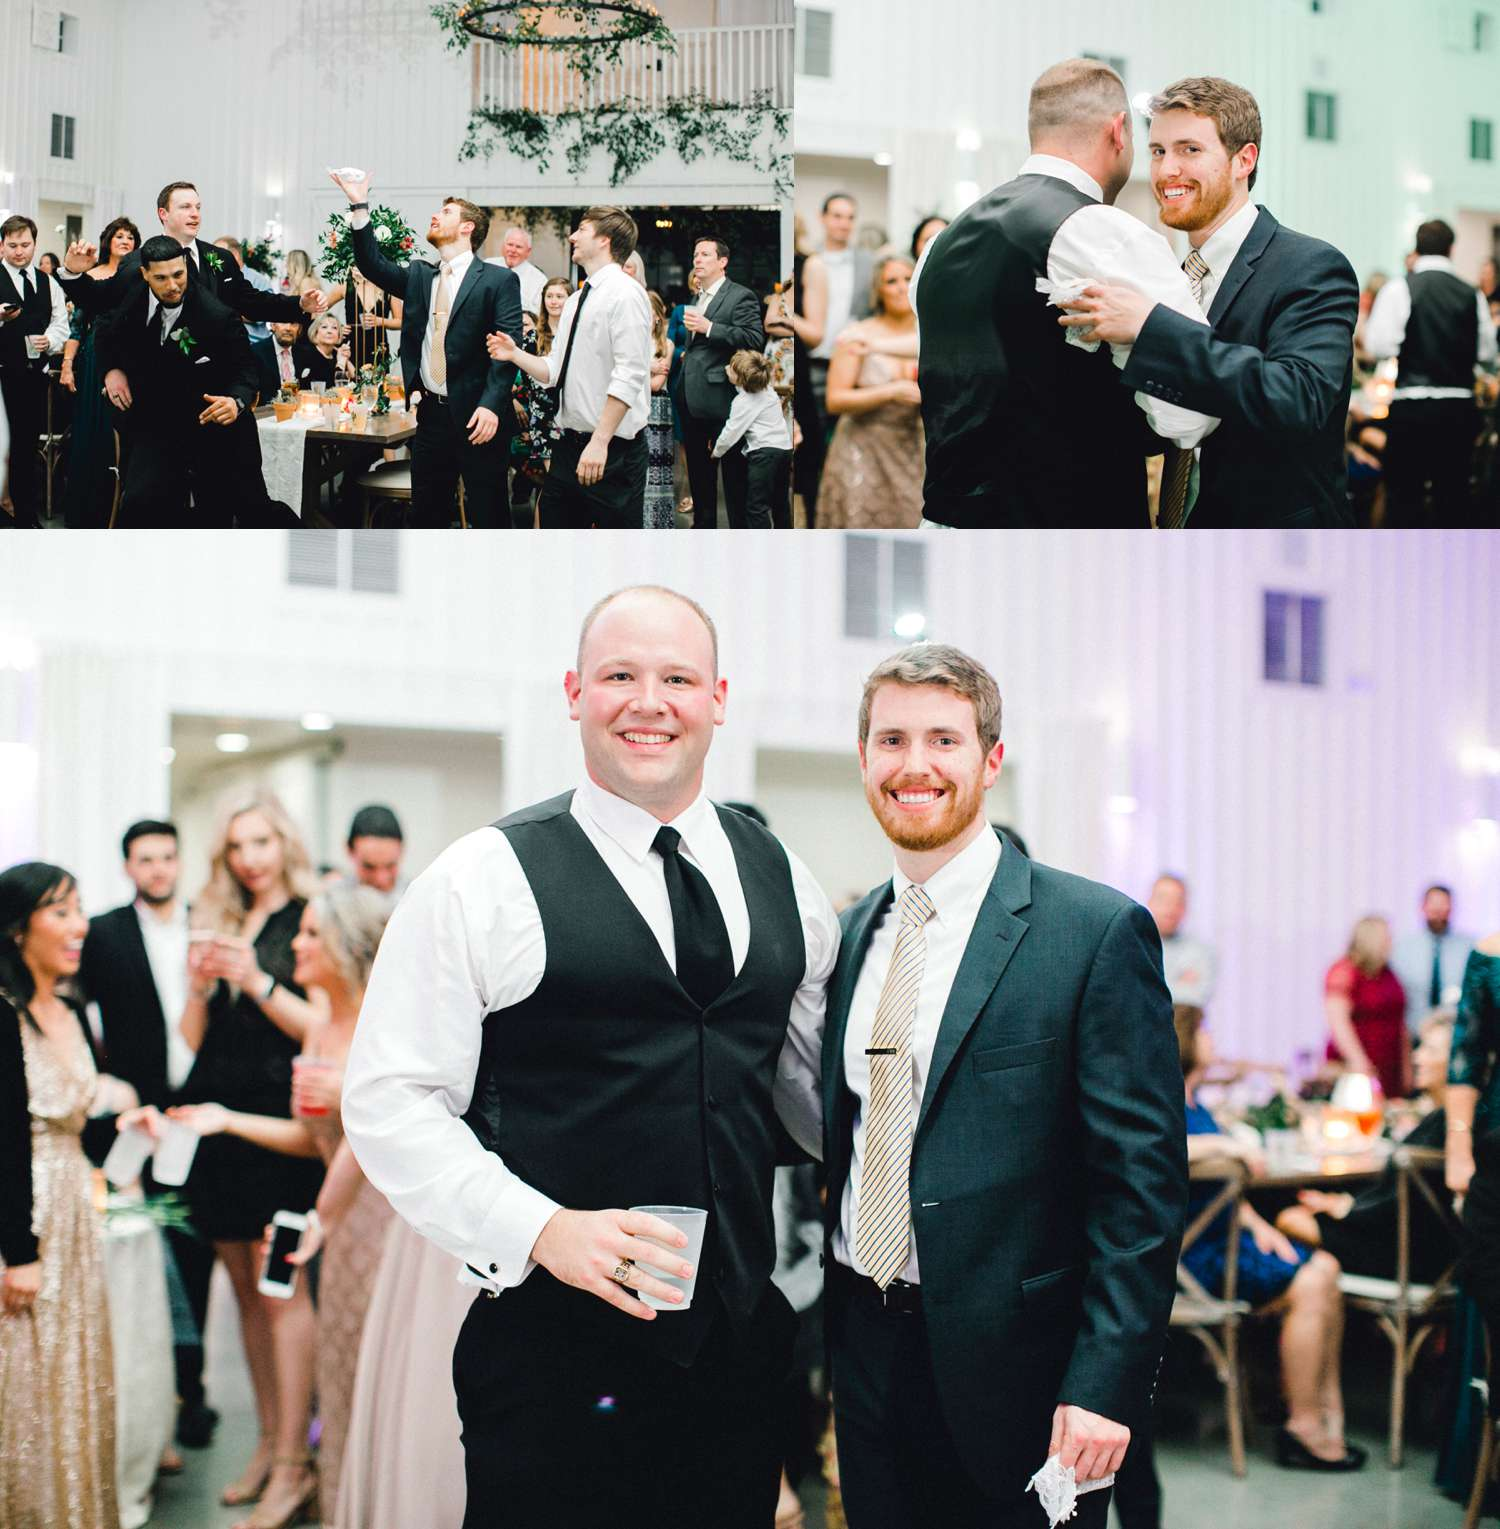 HEBERT_MORGAN_AND_CLAY_ALLEEJ_THE_FARMHOUSE_MONTGOMERY_TEXAS_WEDDING_0209.jpg